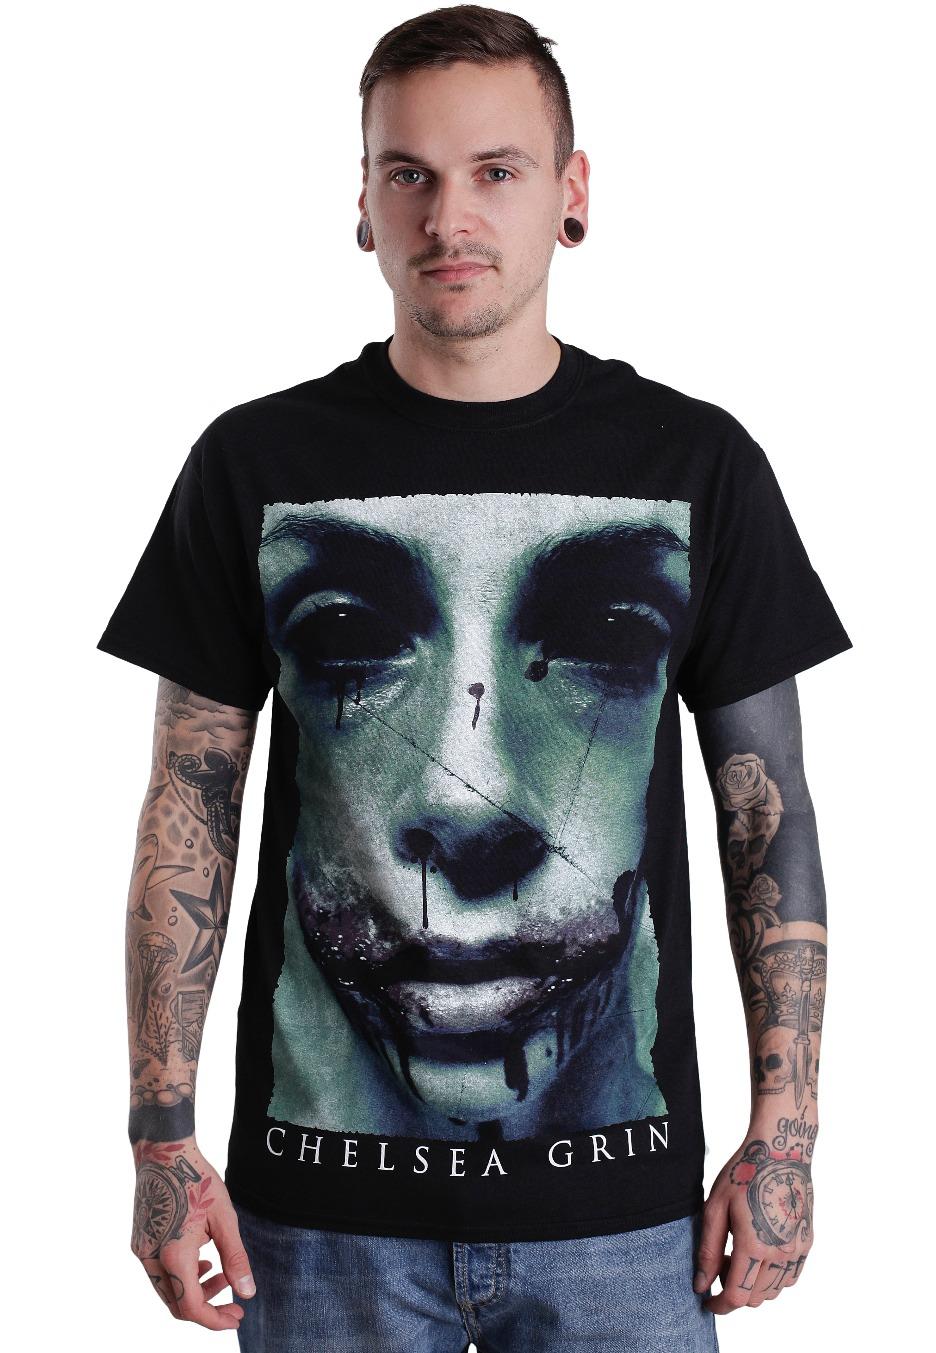 chelsea grin girl photo face t shirt official deathcore merchandise shop uk. Black Bedroom Furniture Sets. Home Design Ideas